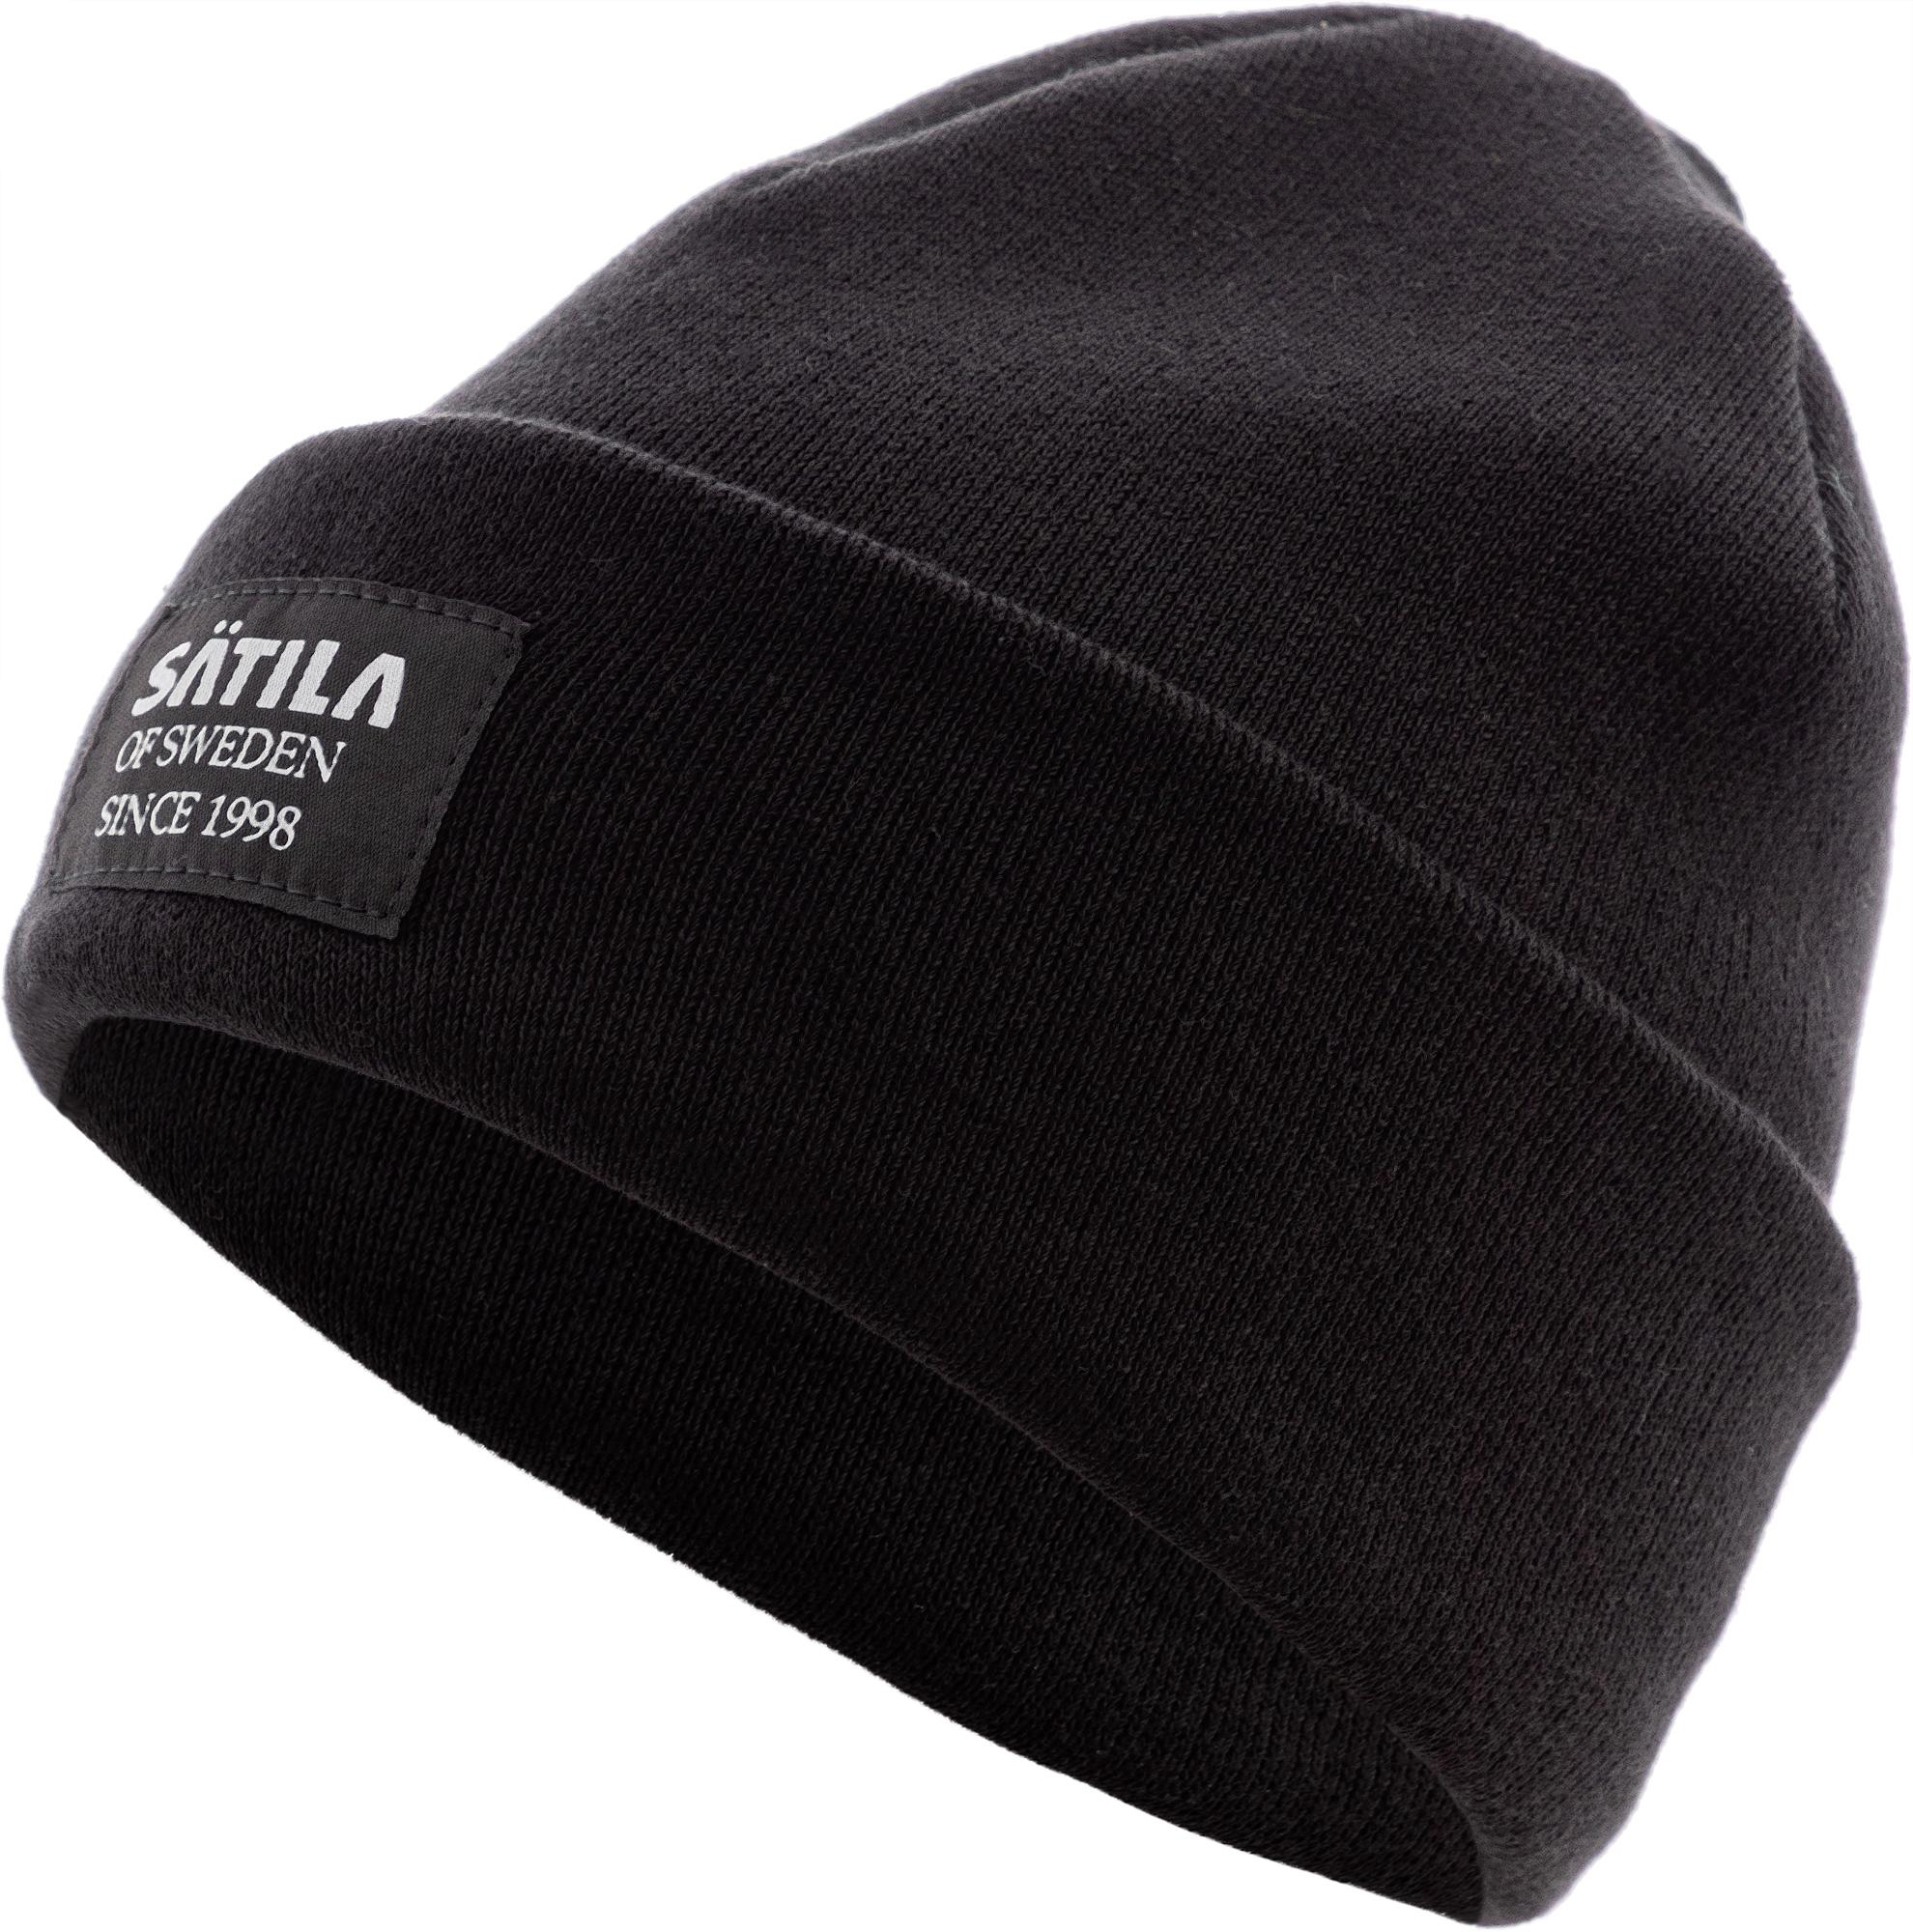 Satila Шапка Satila Tommy, размер 58 satila шапка satila reflect размер 58